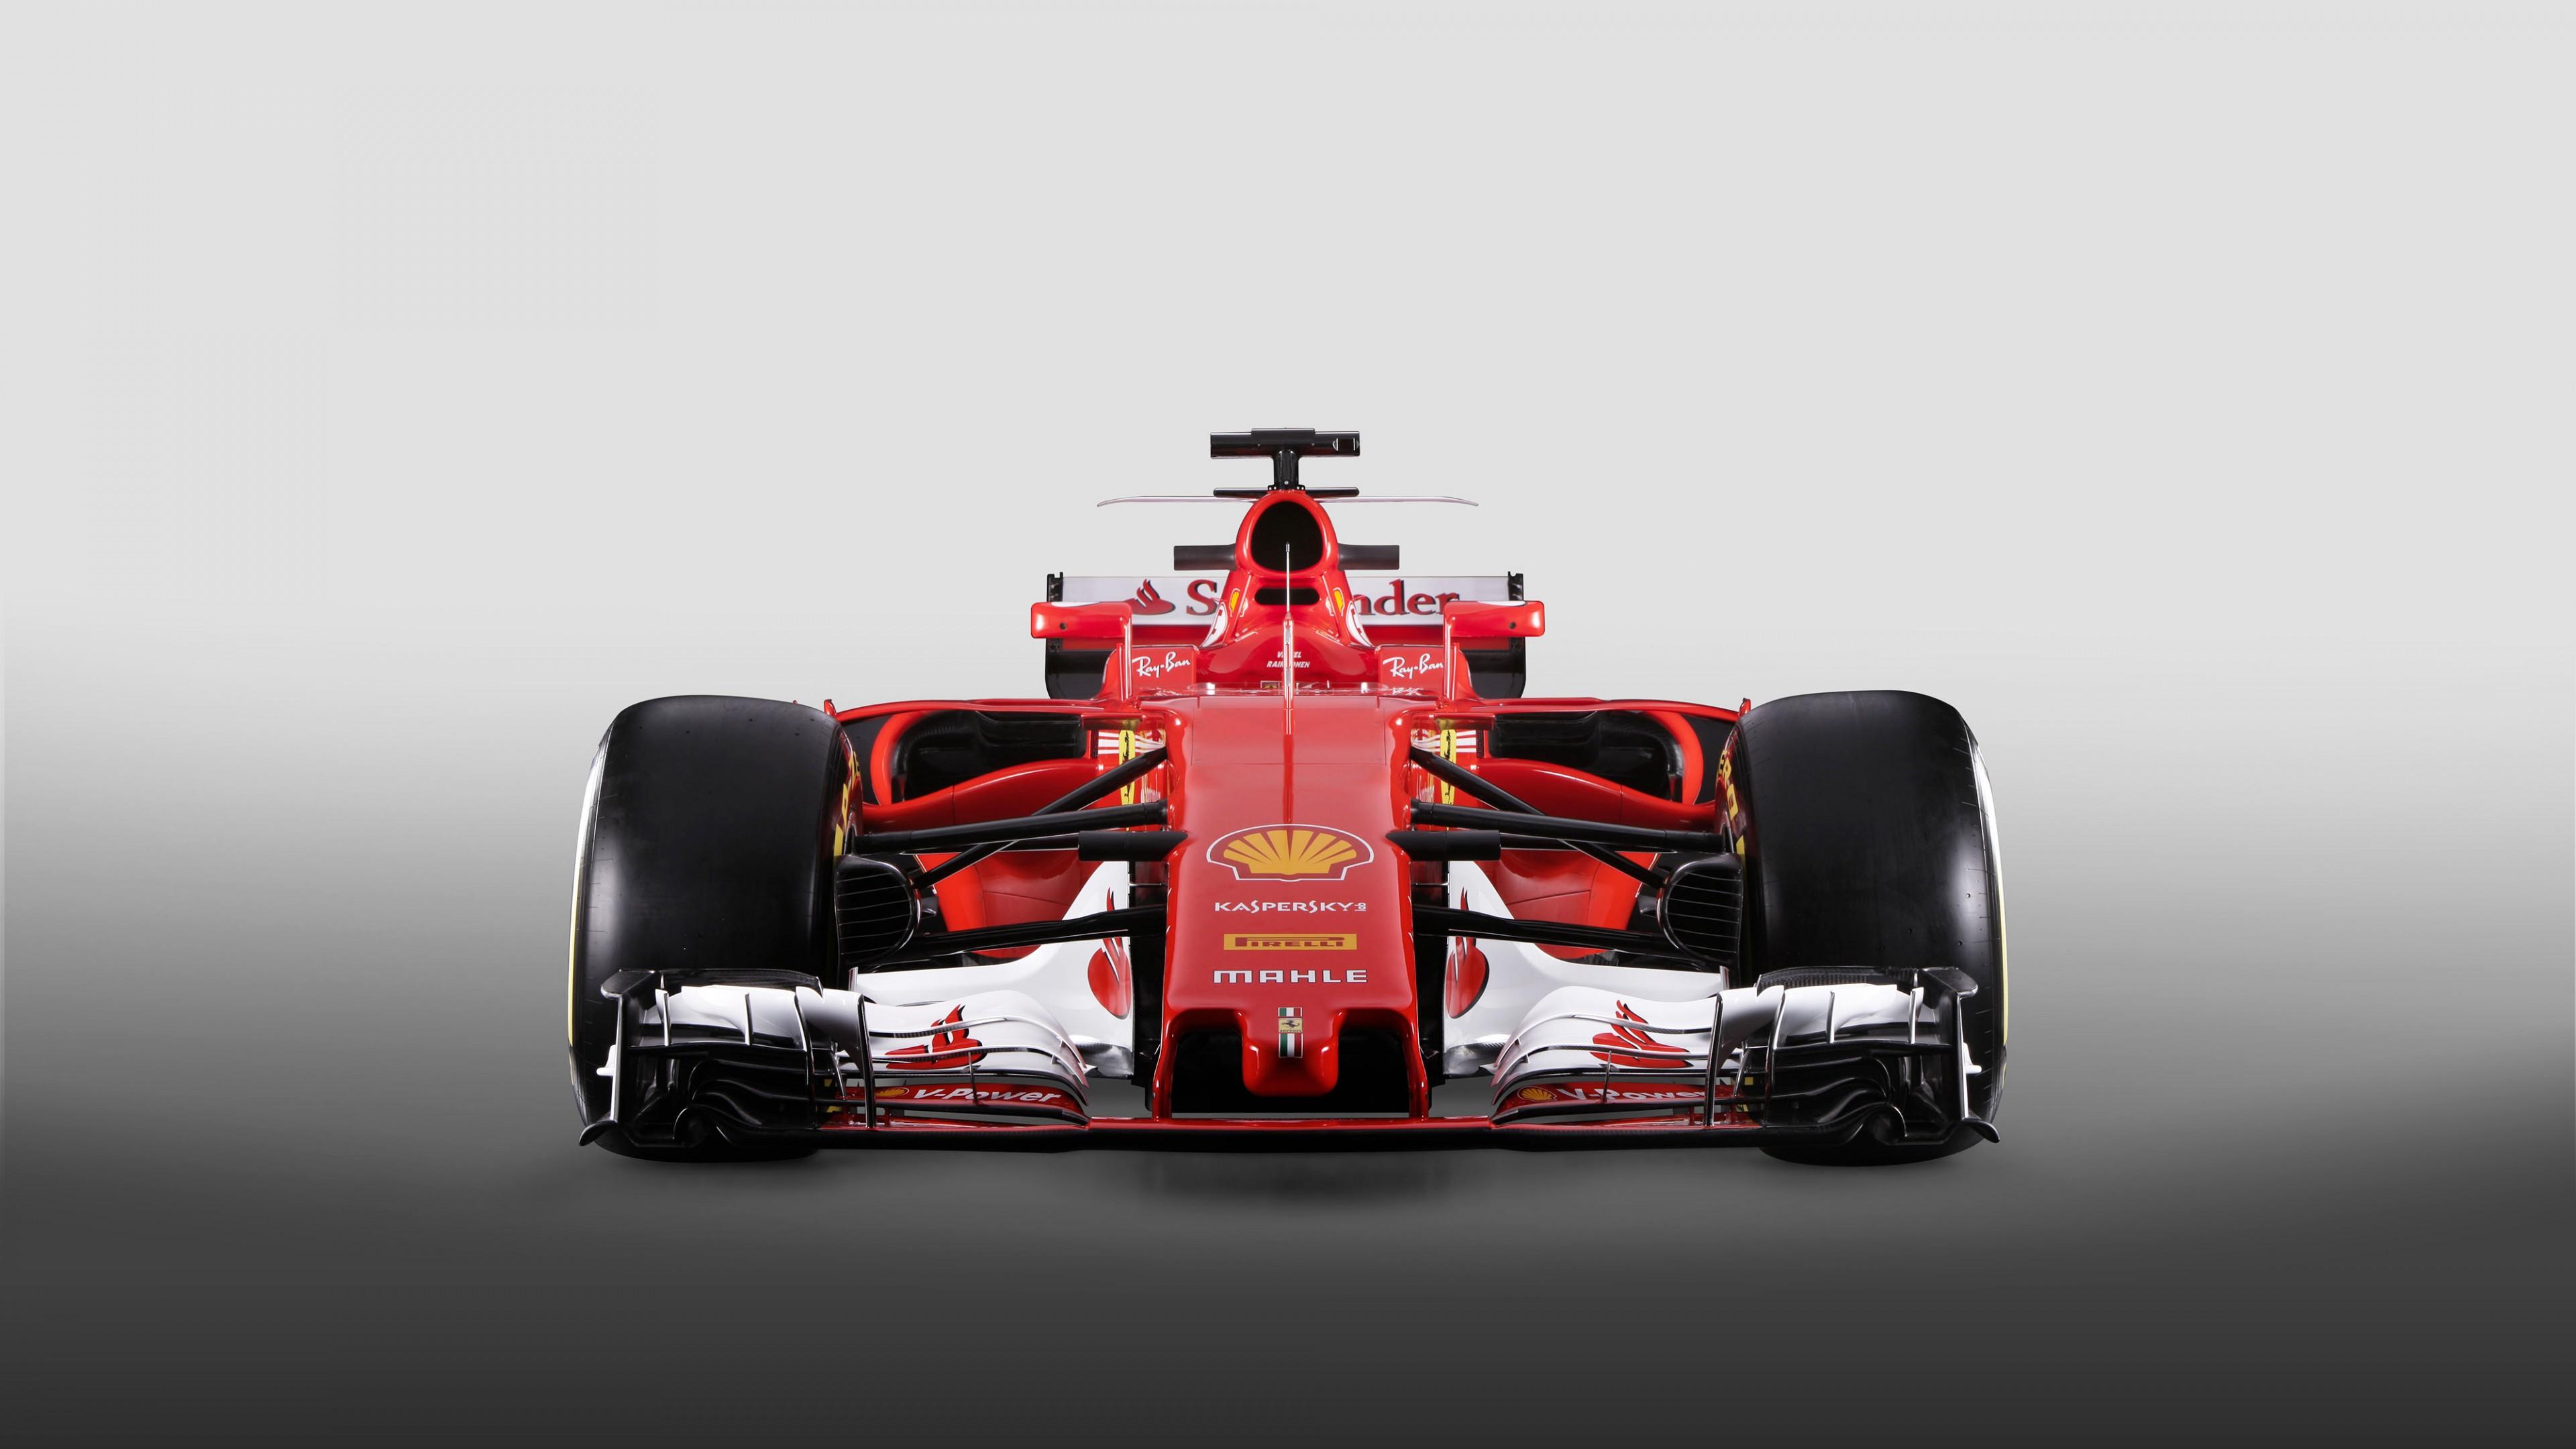 Mercedes Gp Formula 1 4k Hd Desktop Wallpaper For 4k Ultra: 2017 Ferrari SF70H Formula One 4K Wallpaper